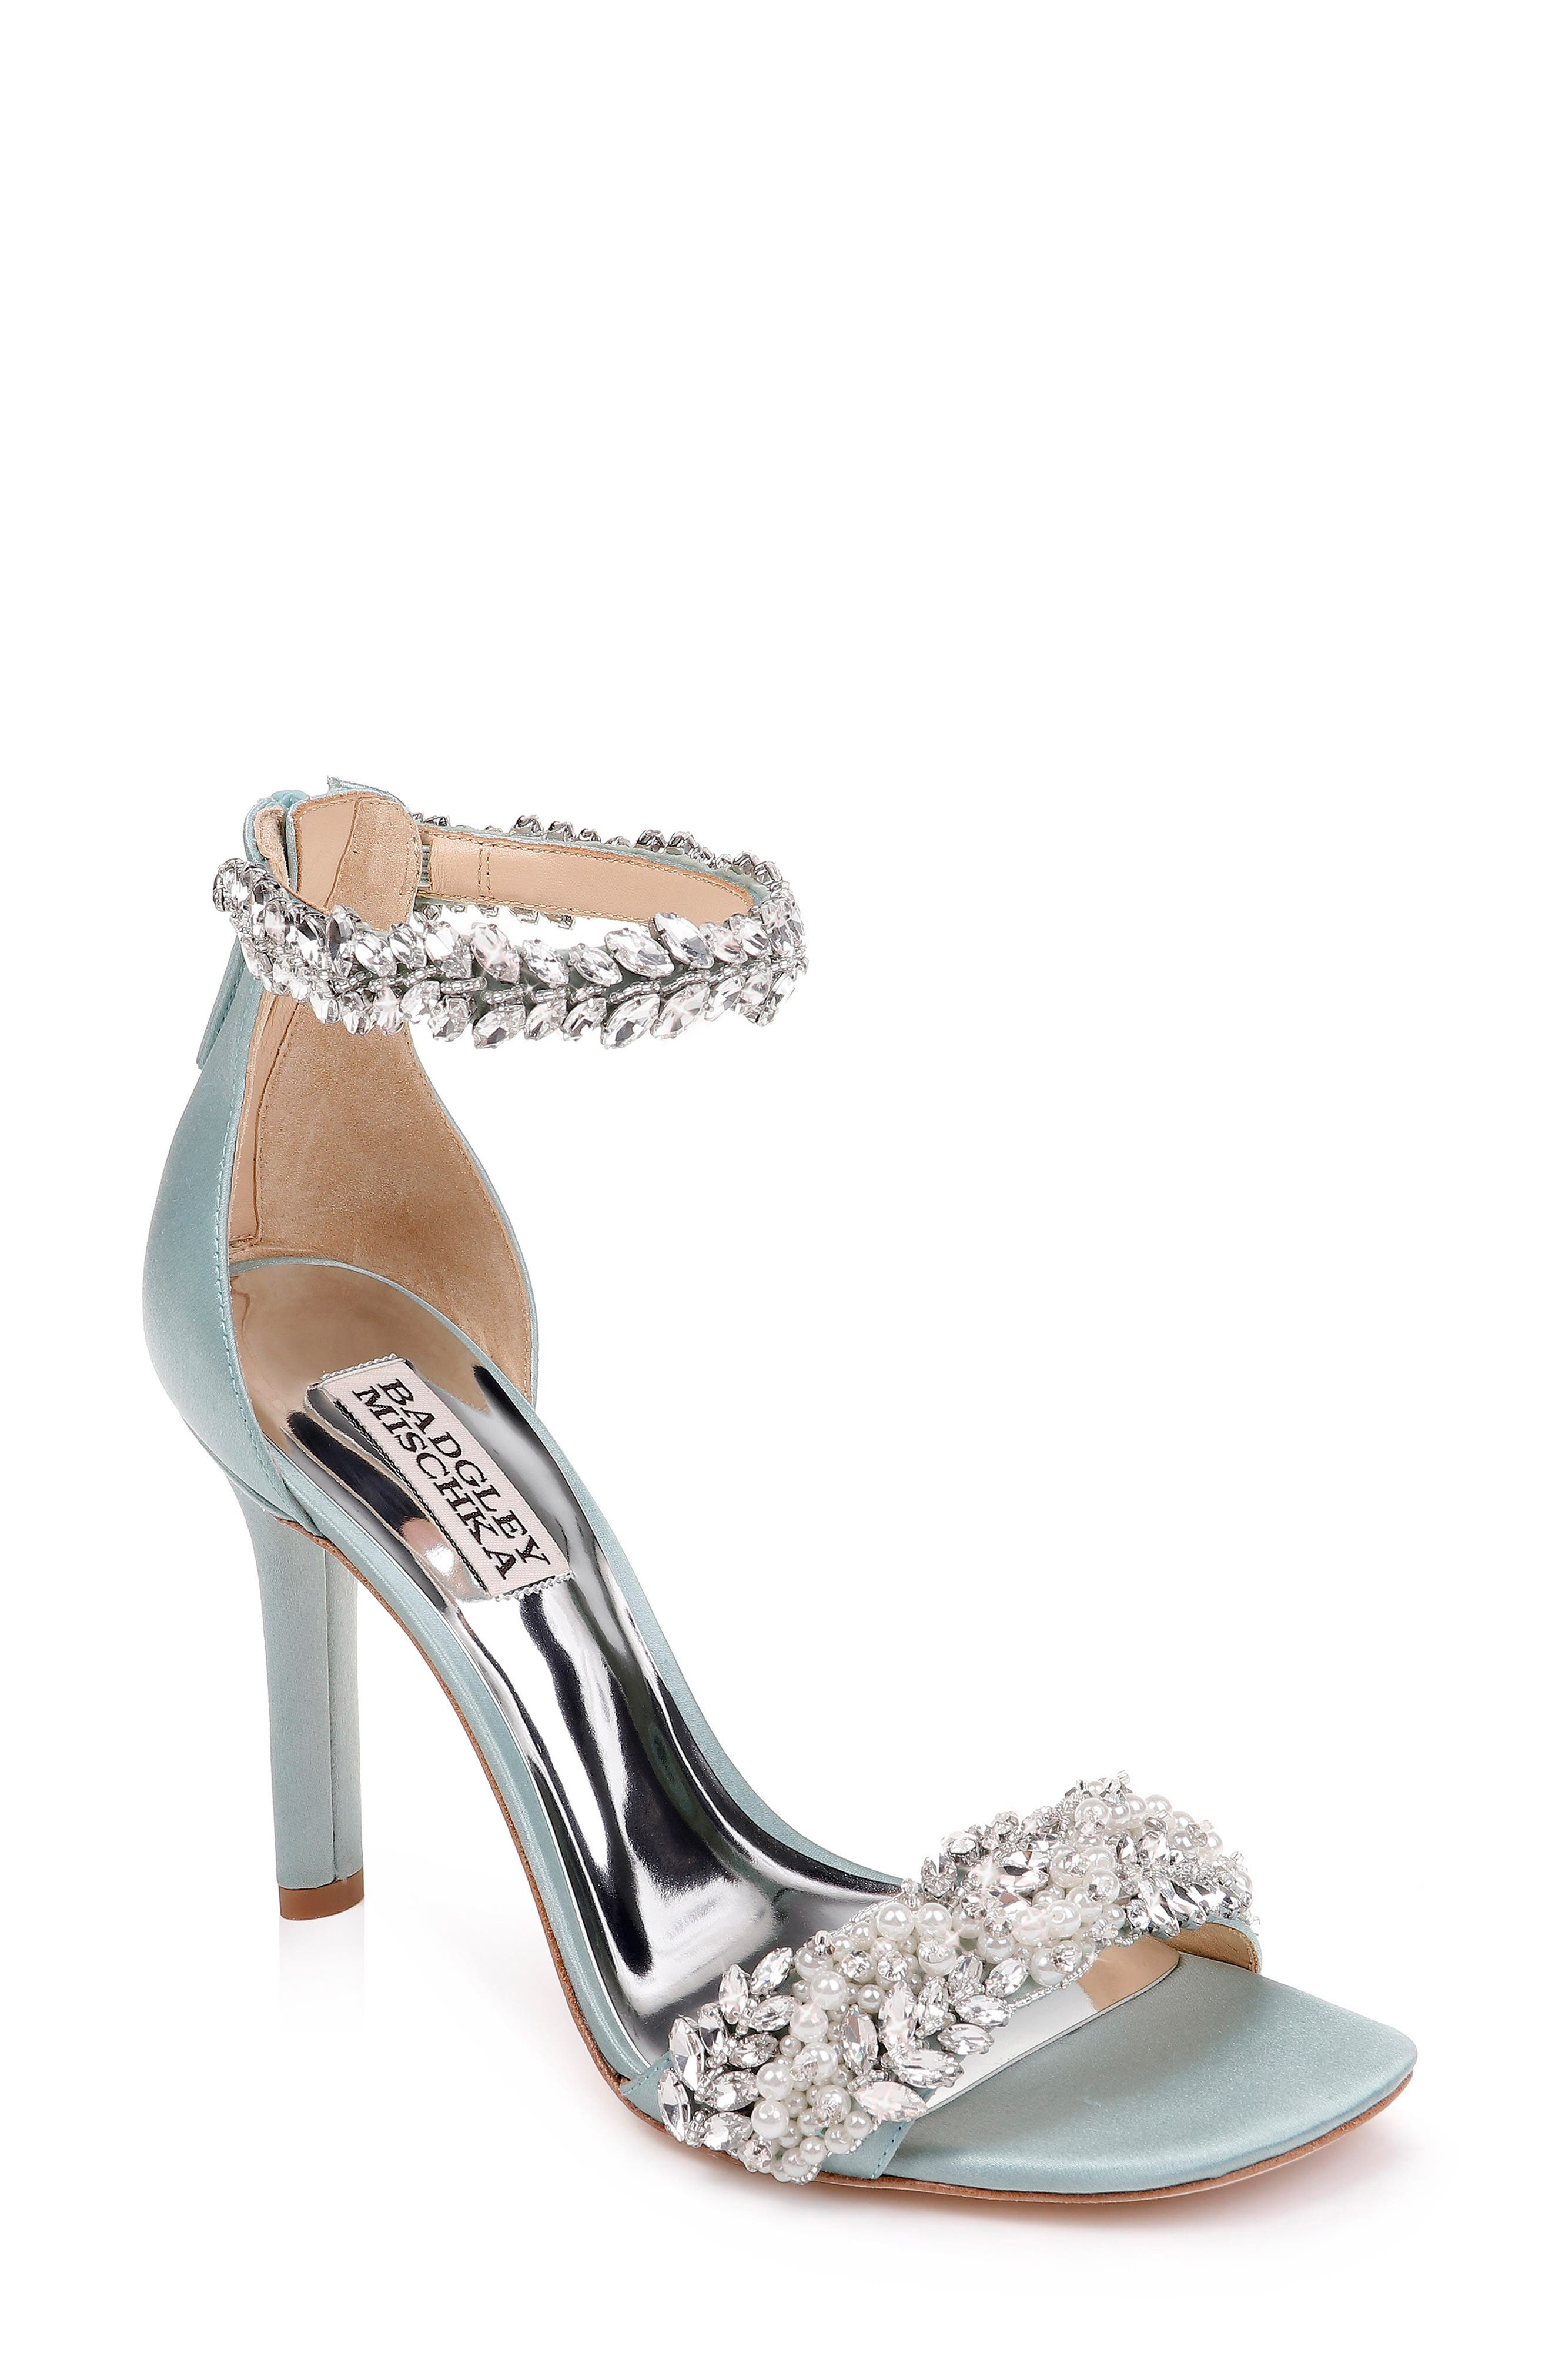 e6b2e59da Badgley Mischka Fiorenza Crystal   Imitation Pearl Embellished Sandal